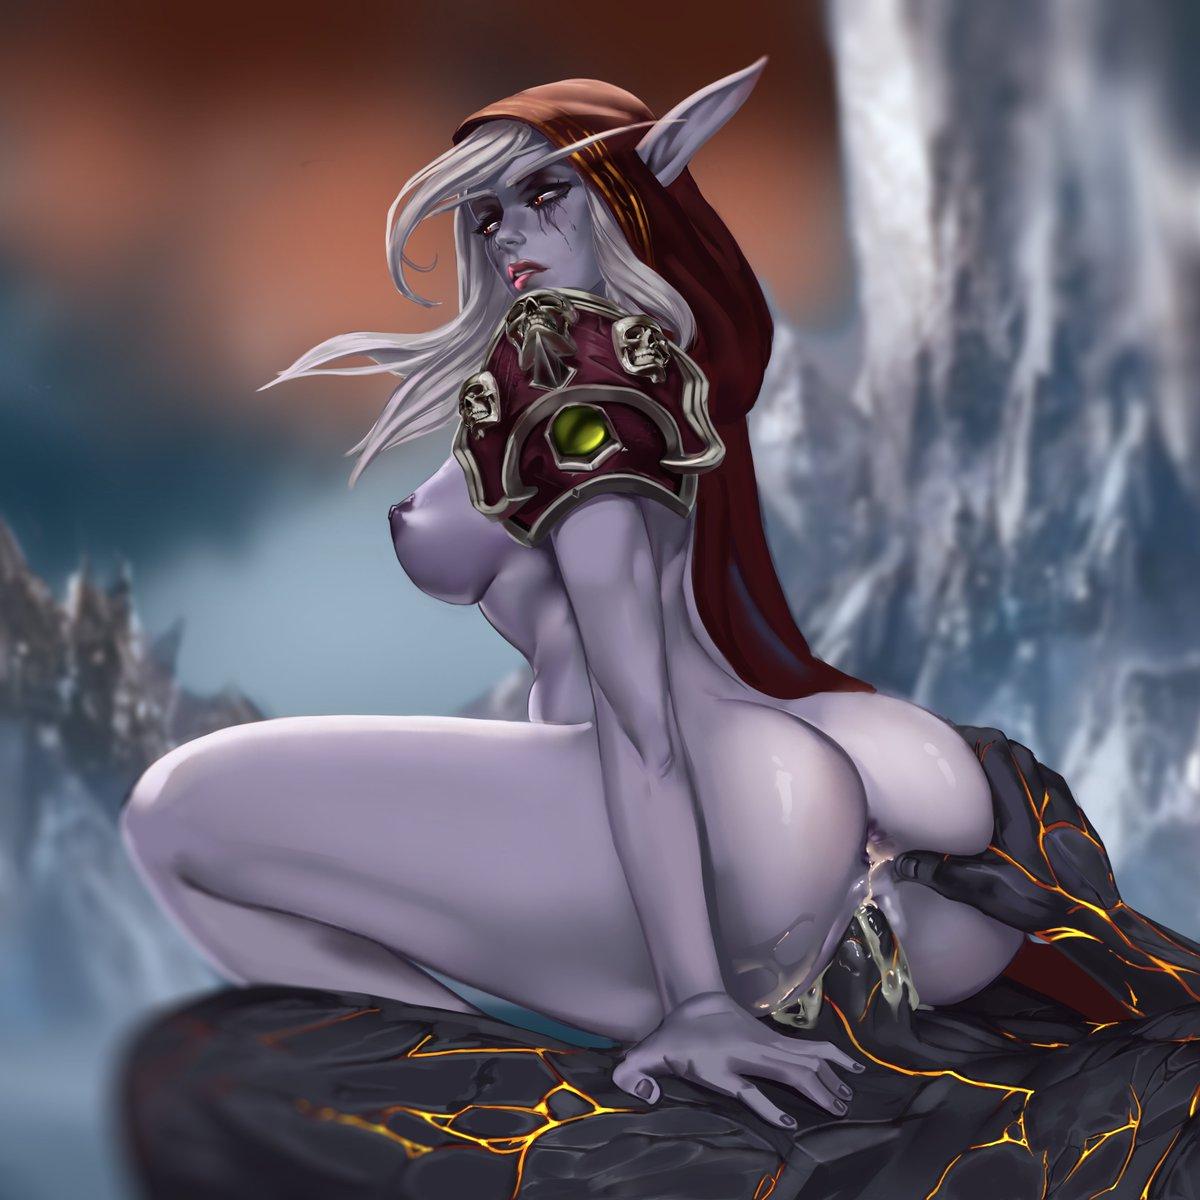 Sylvanas windrunner, the queen of the forsaken